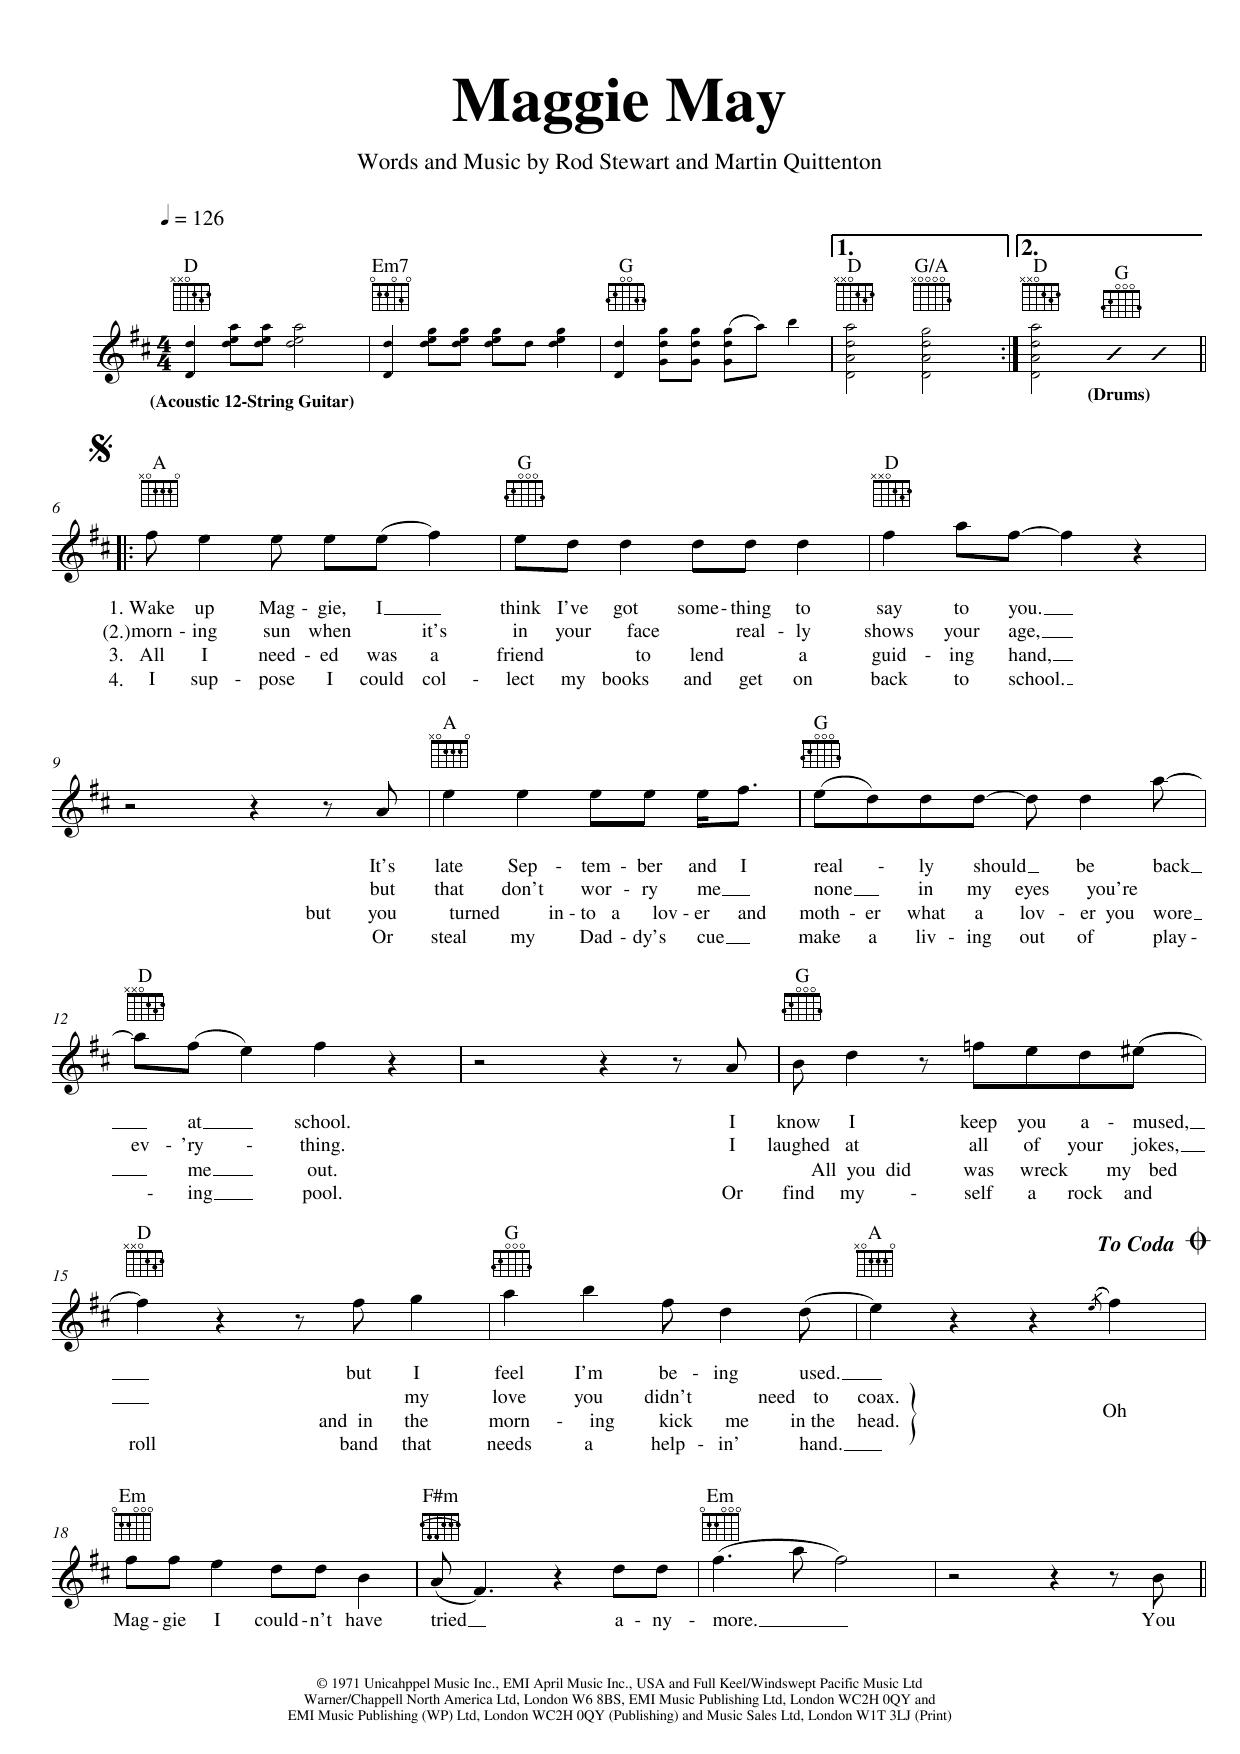 Maggie May Sheet Music